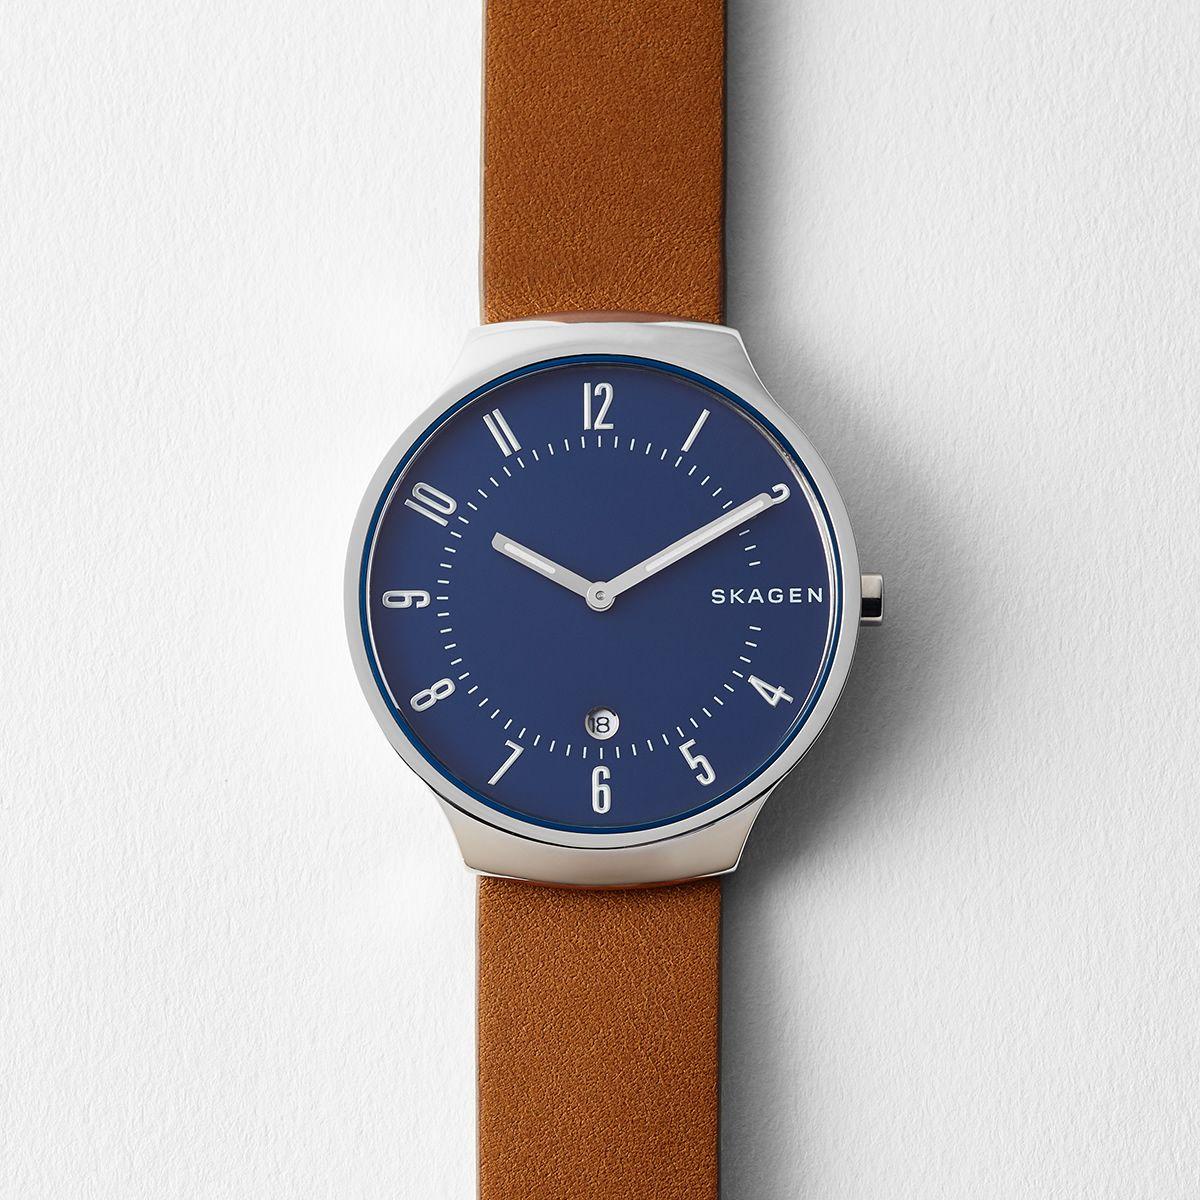 9c6ba699bdf Skagen Mens Watches - Macy s